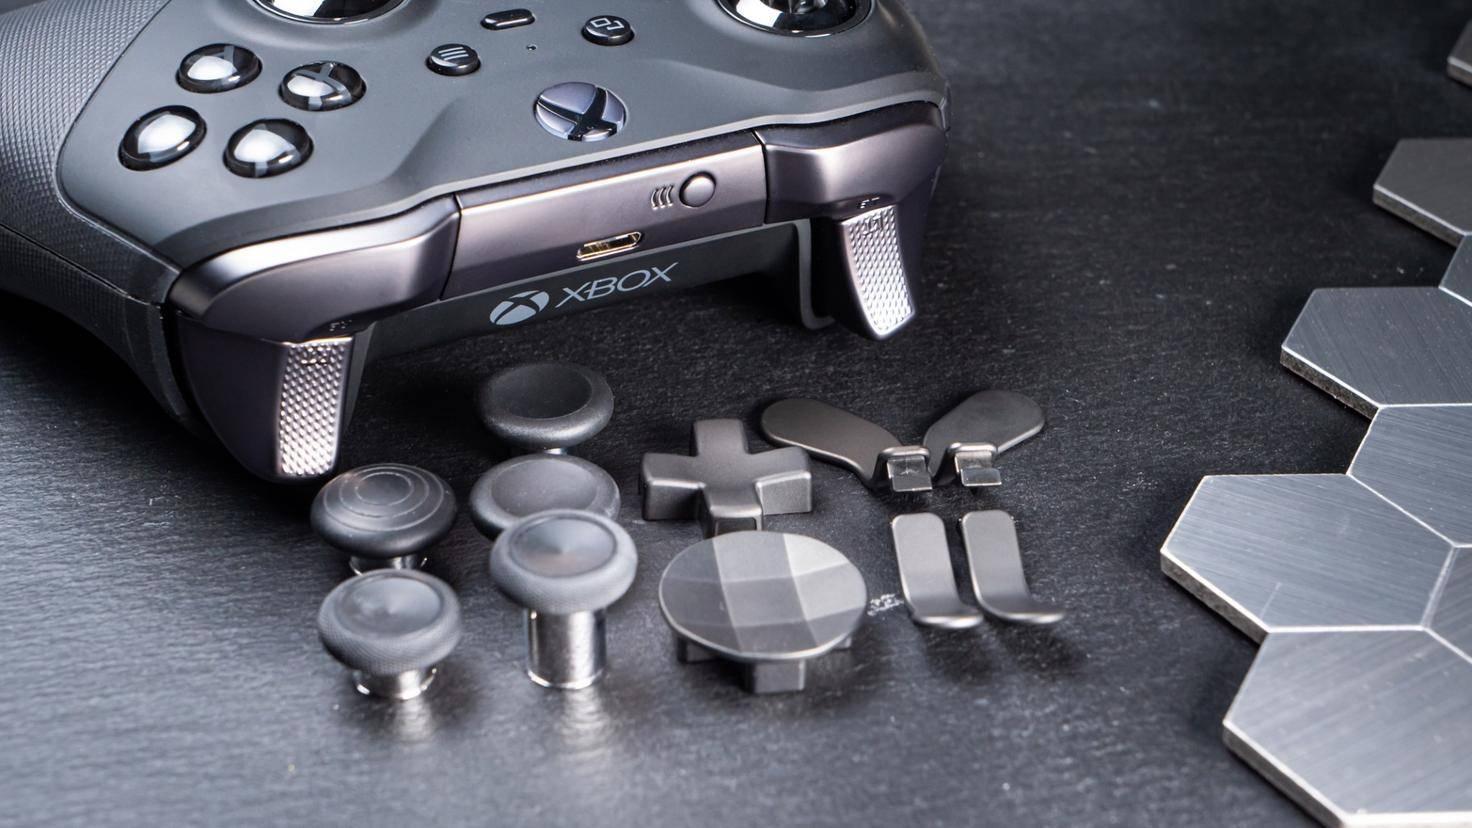 xbox-elite-controller-2-test-07